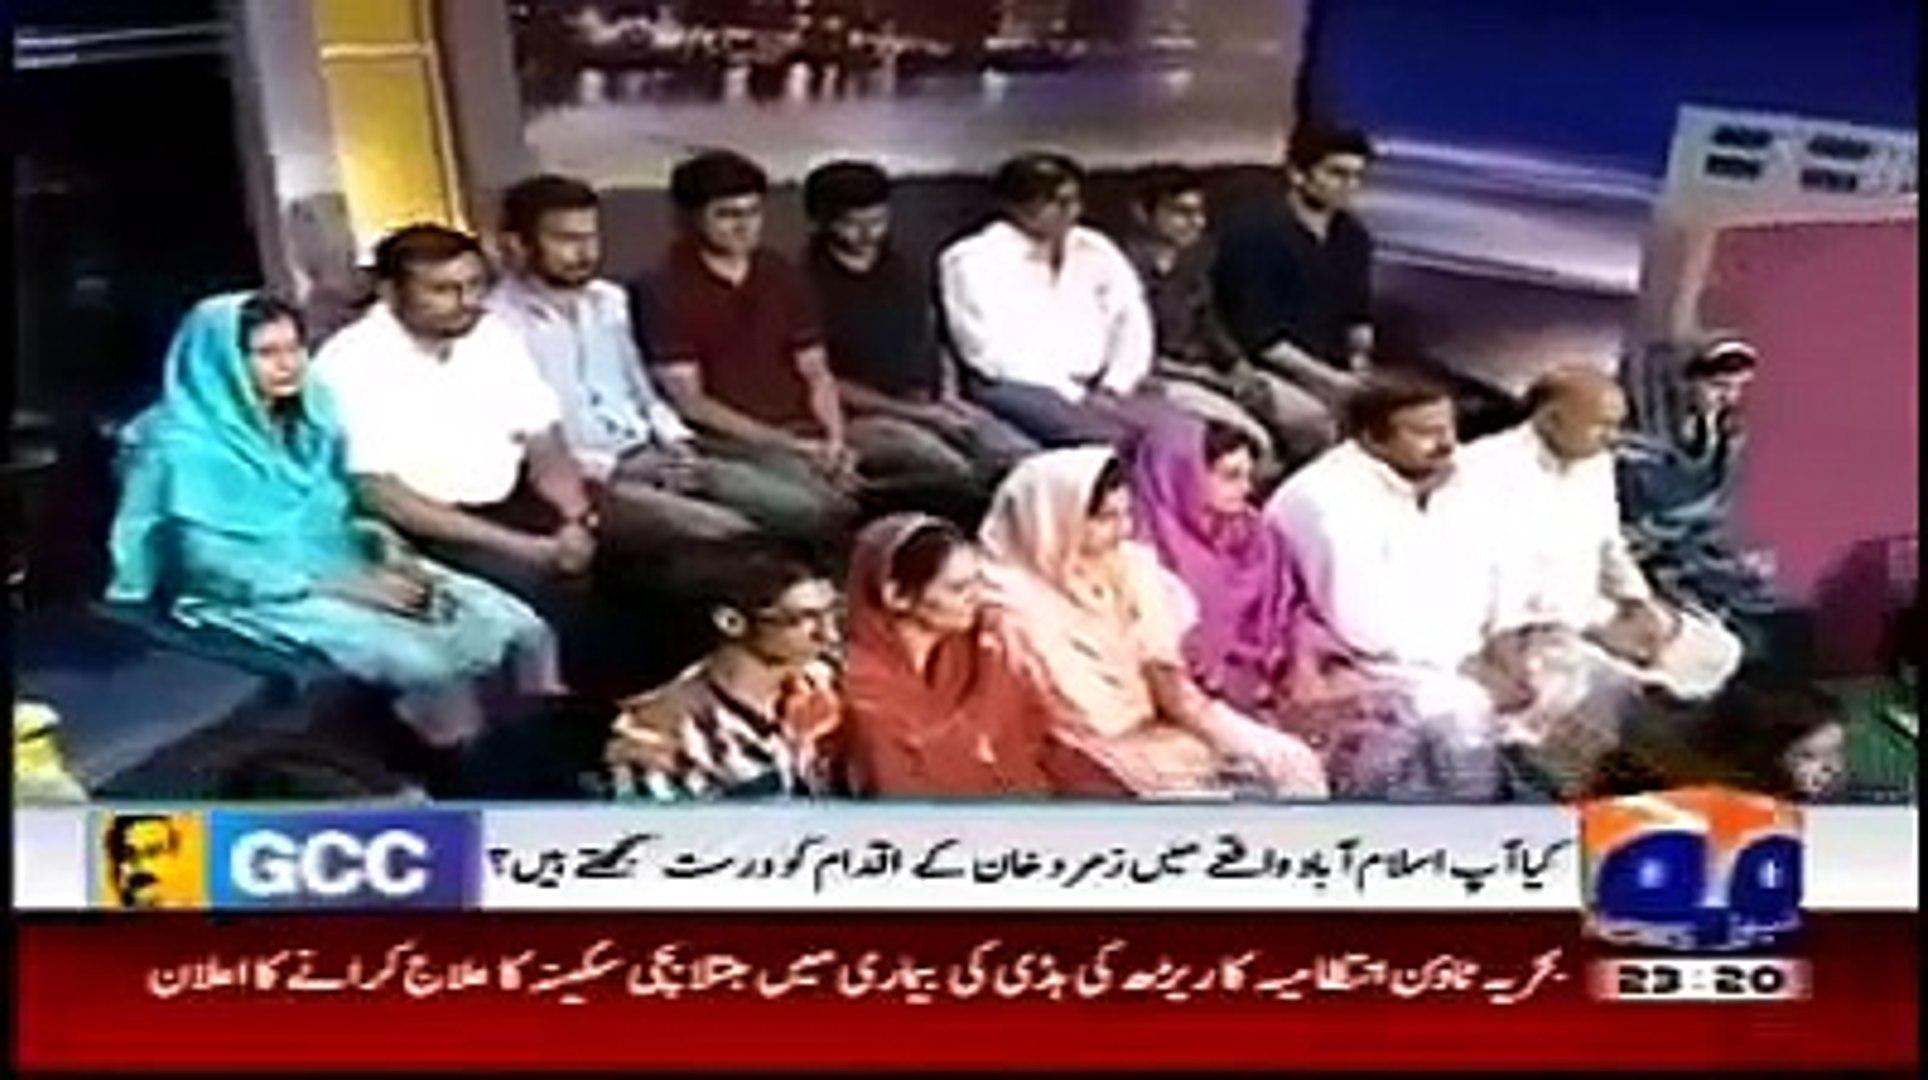 Khabar Naak 16 August 2013 Geo News Khabarnaak 16 08 2013 Full Comedy Show 16th August 2013 P2